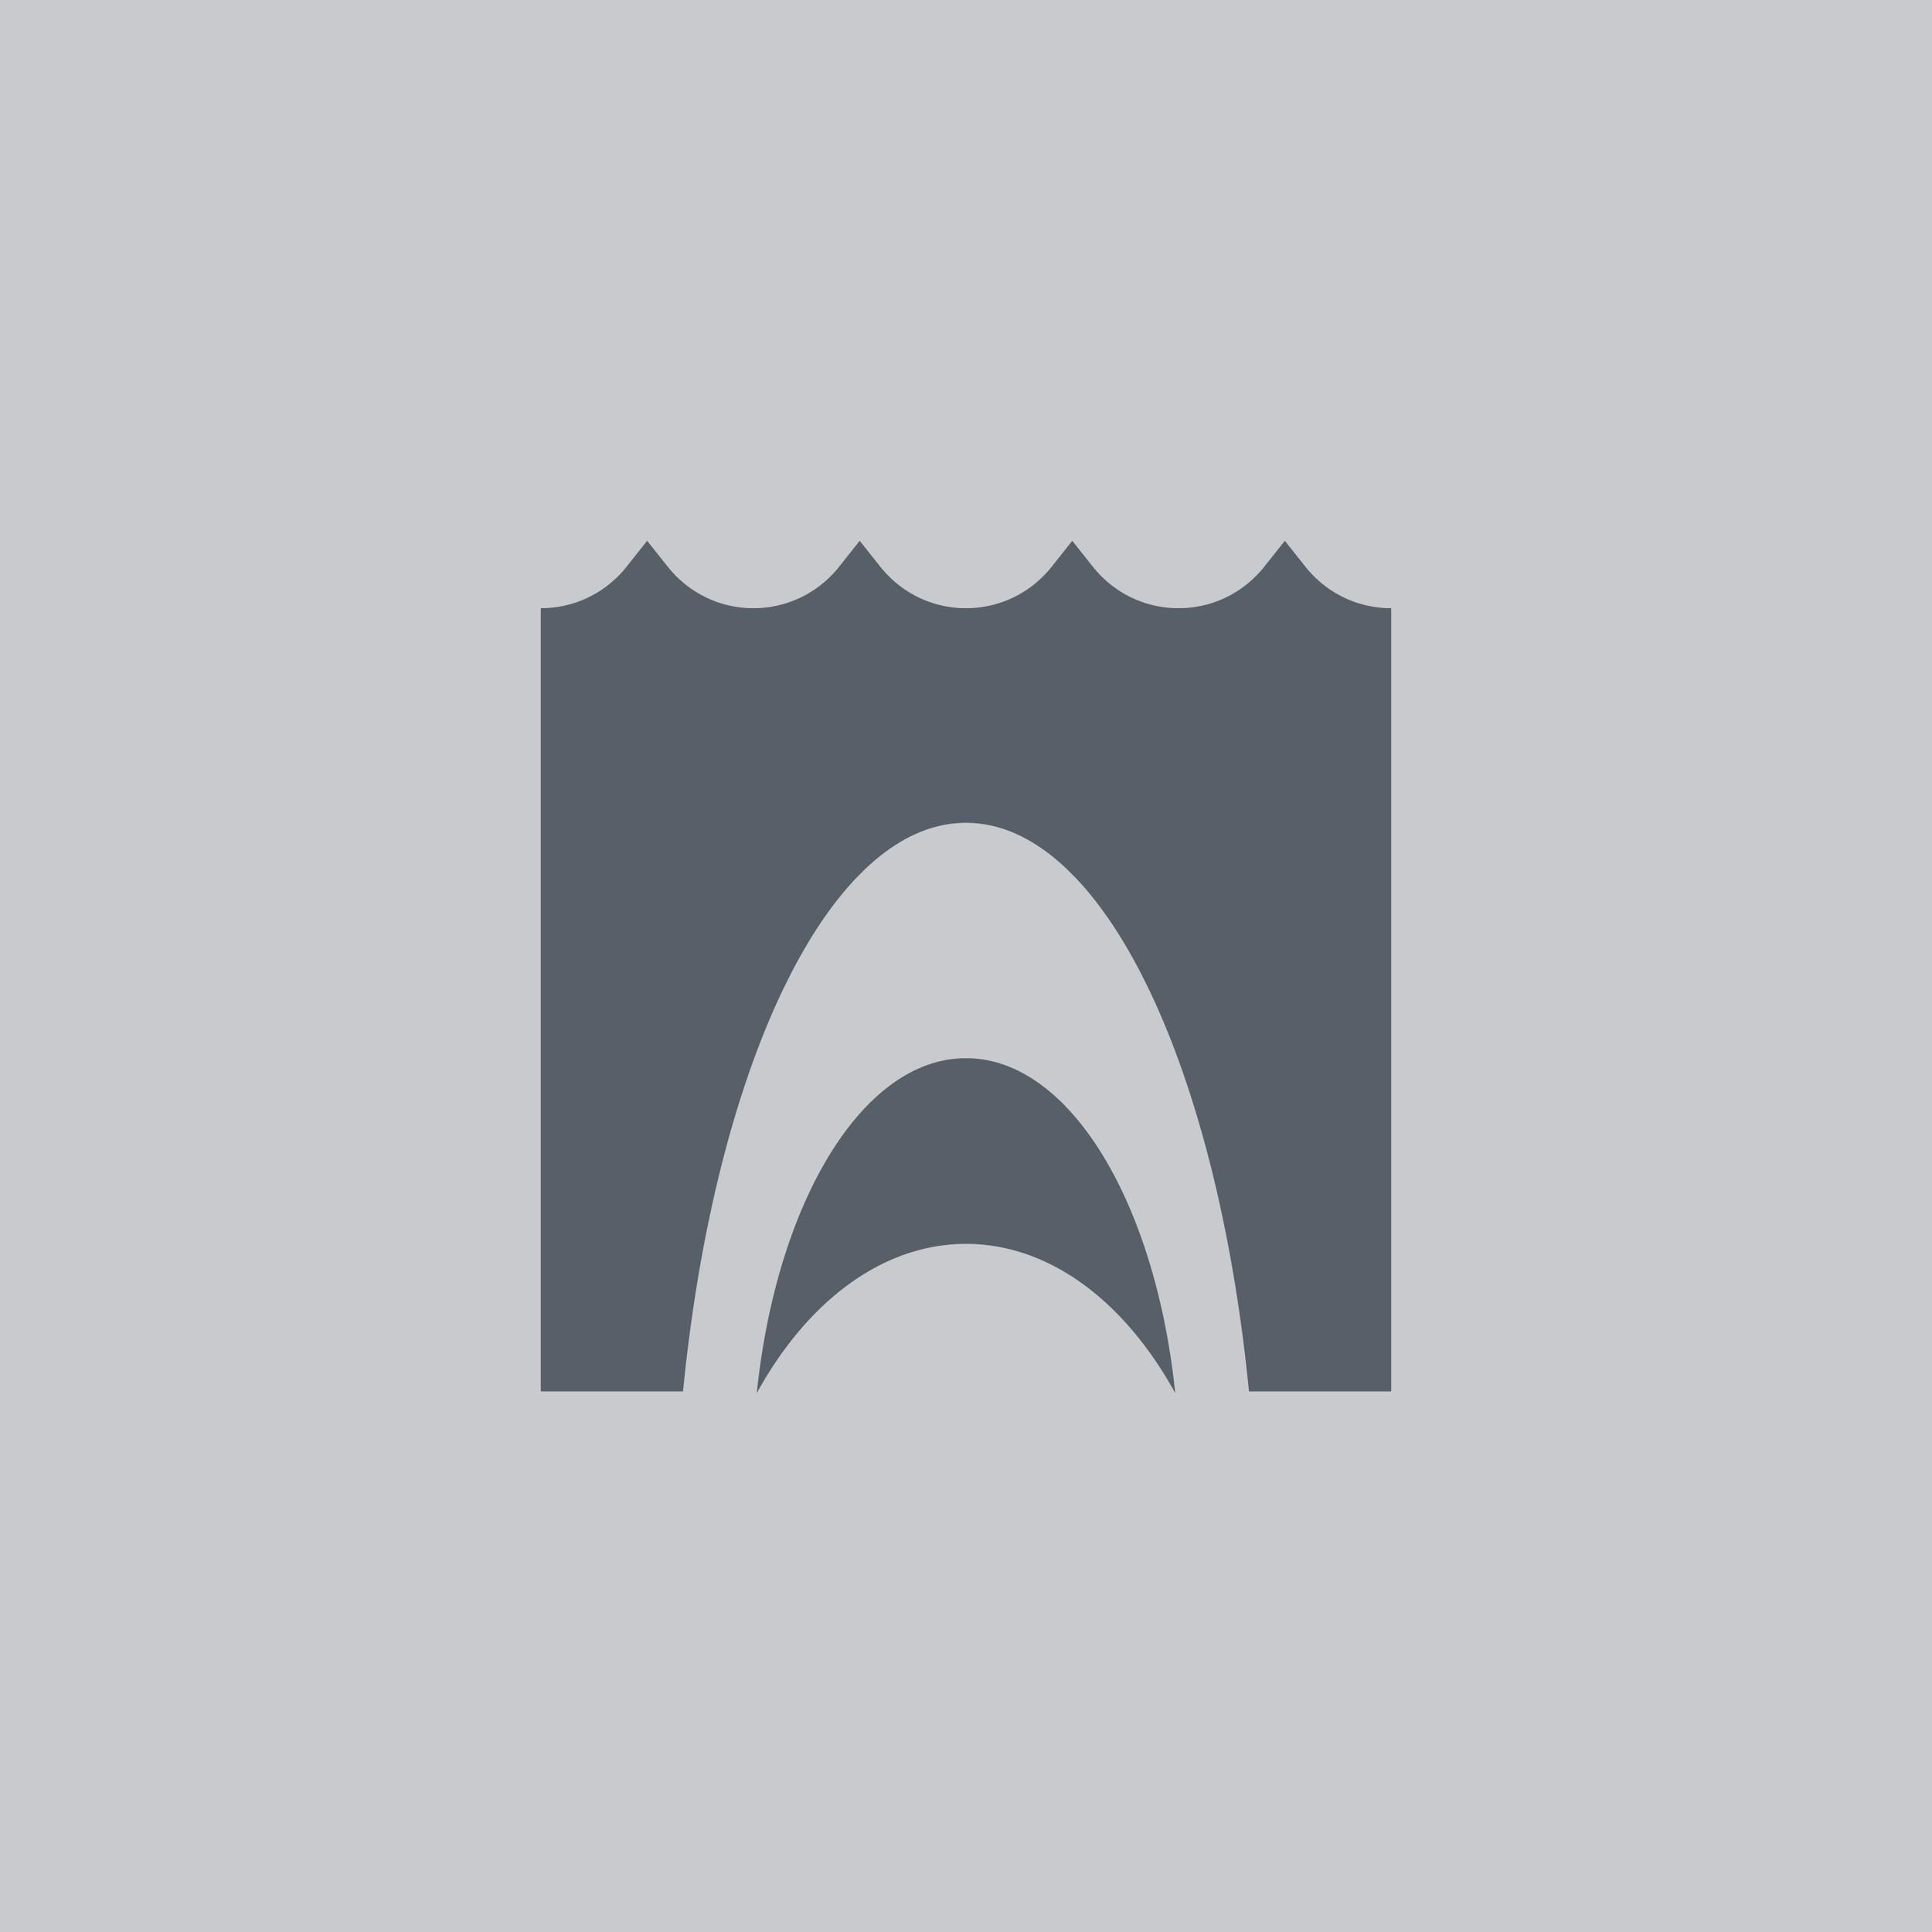 Jaws - Steven Spielberg - Designed by Chris Cureton